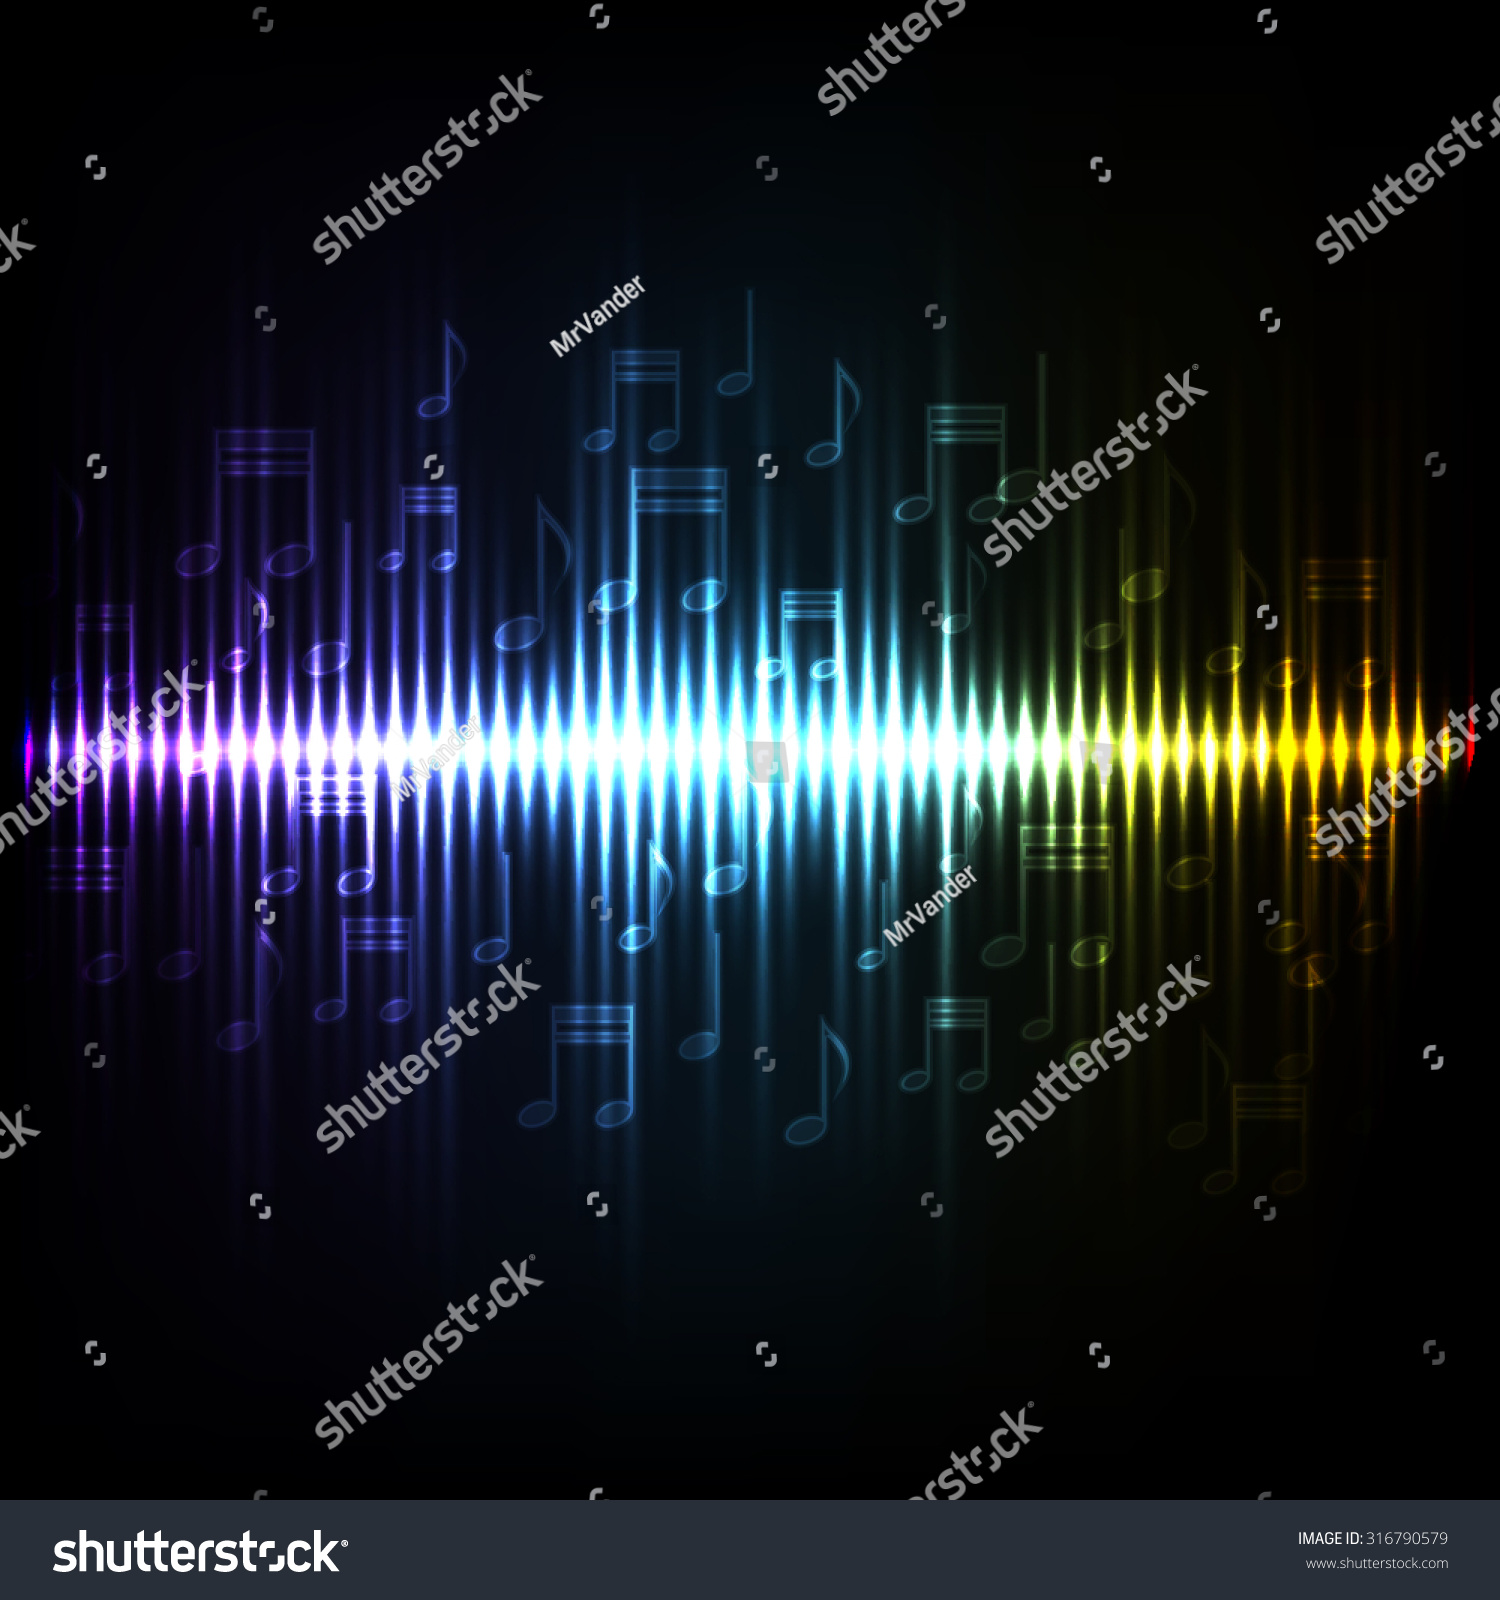 Images Of Sound Waves Oscillating Glow Calto Radiowavesdiagram Radio Diagram Light Abstract Technology